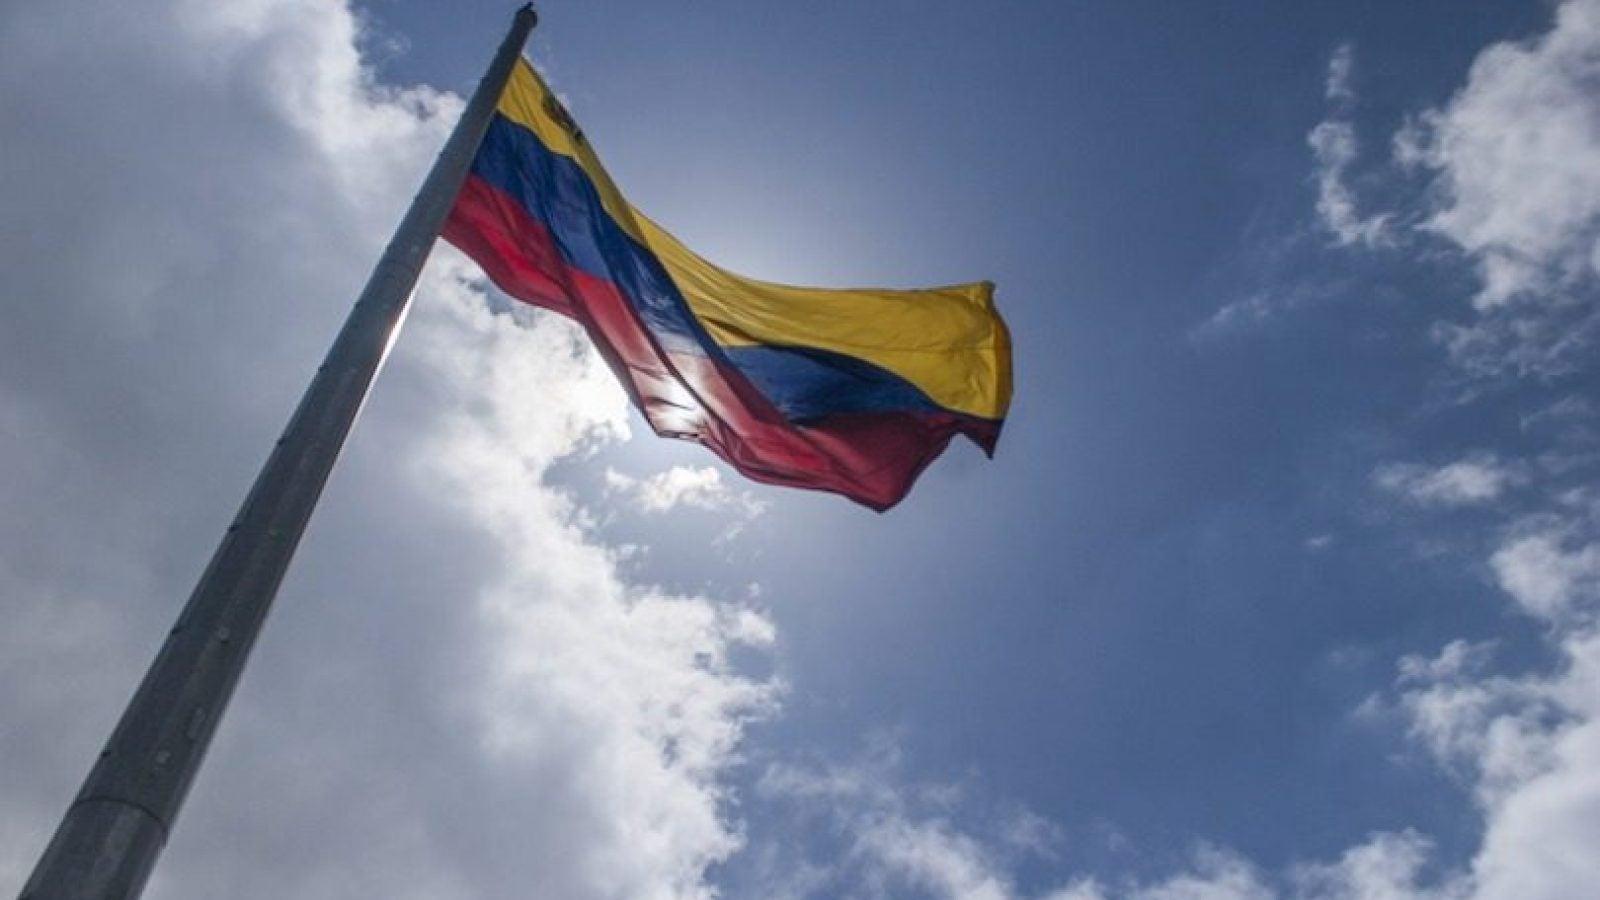 The Venezuelan flag flies against a sunny blue sky with clouds